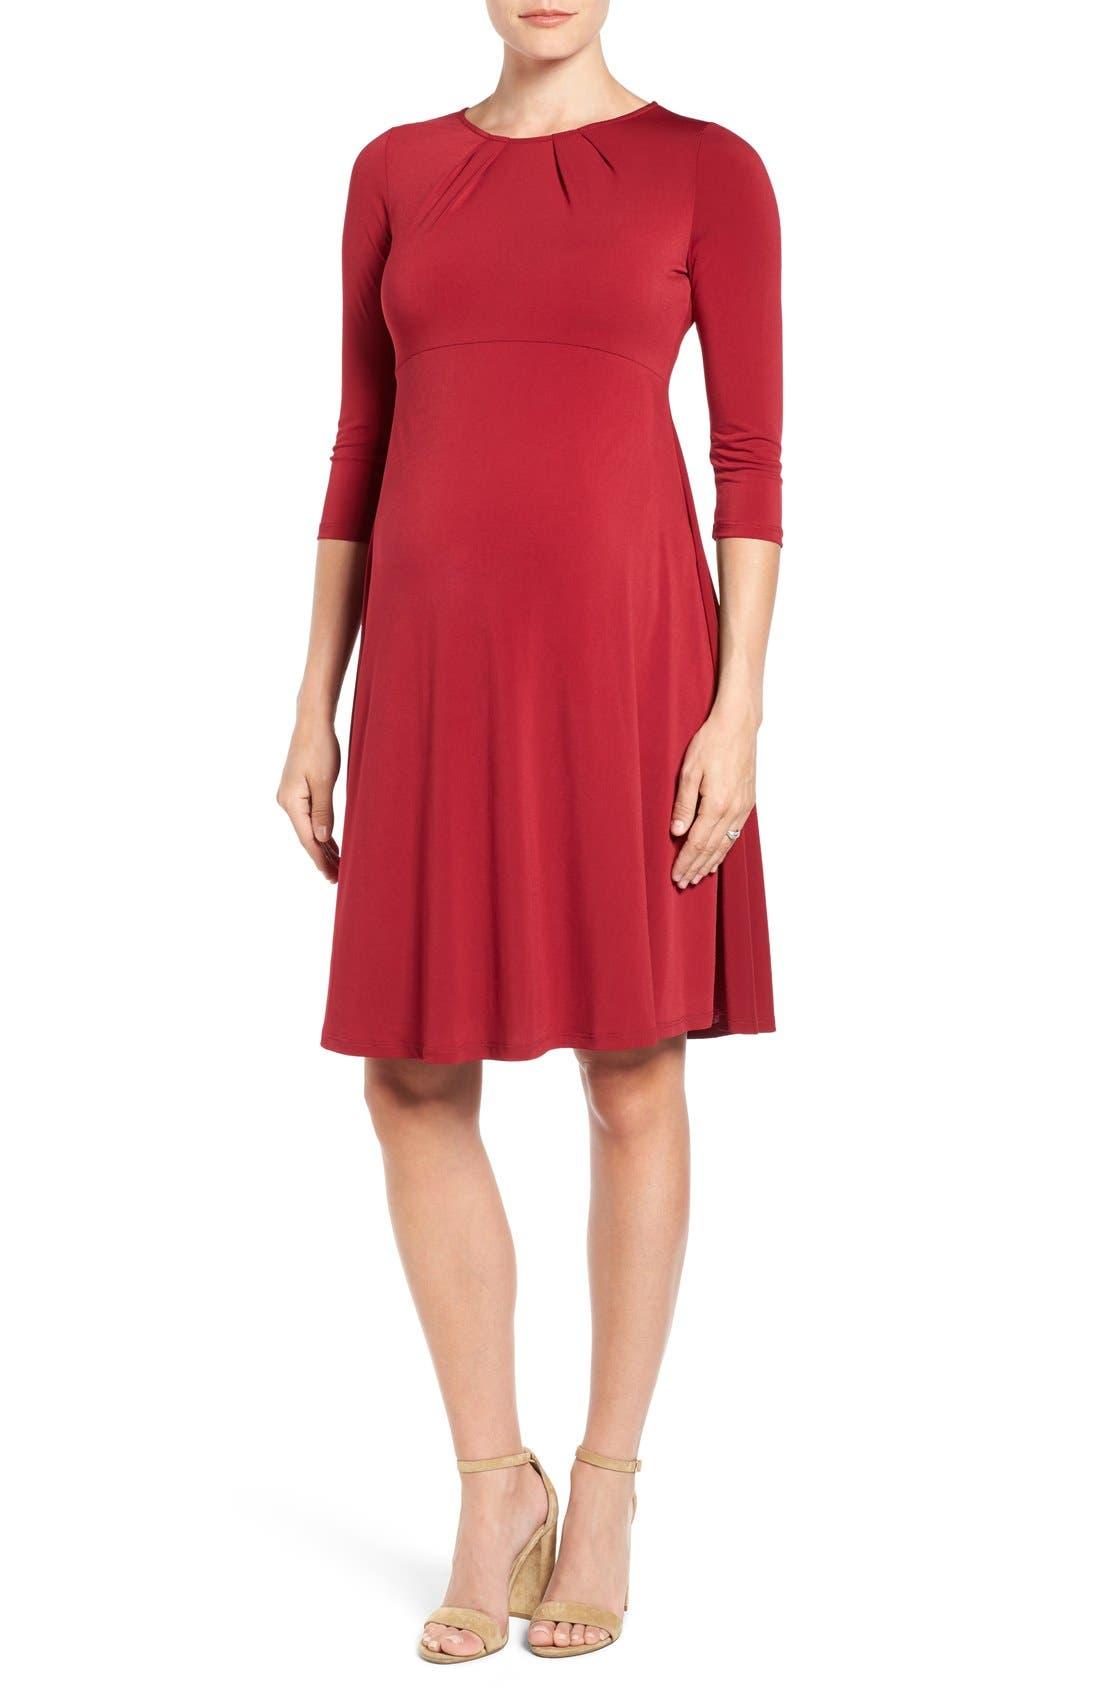 LEOTA 'Simone' Empire Waist Jersey Maternity Dress